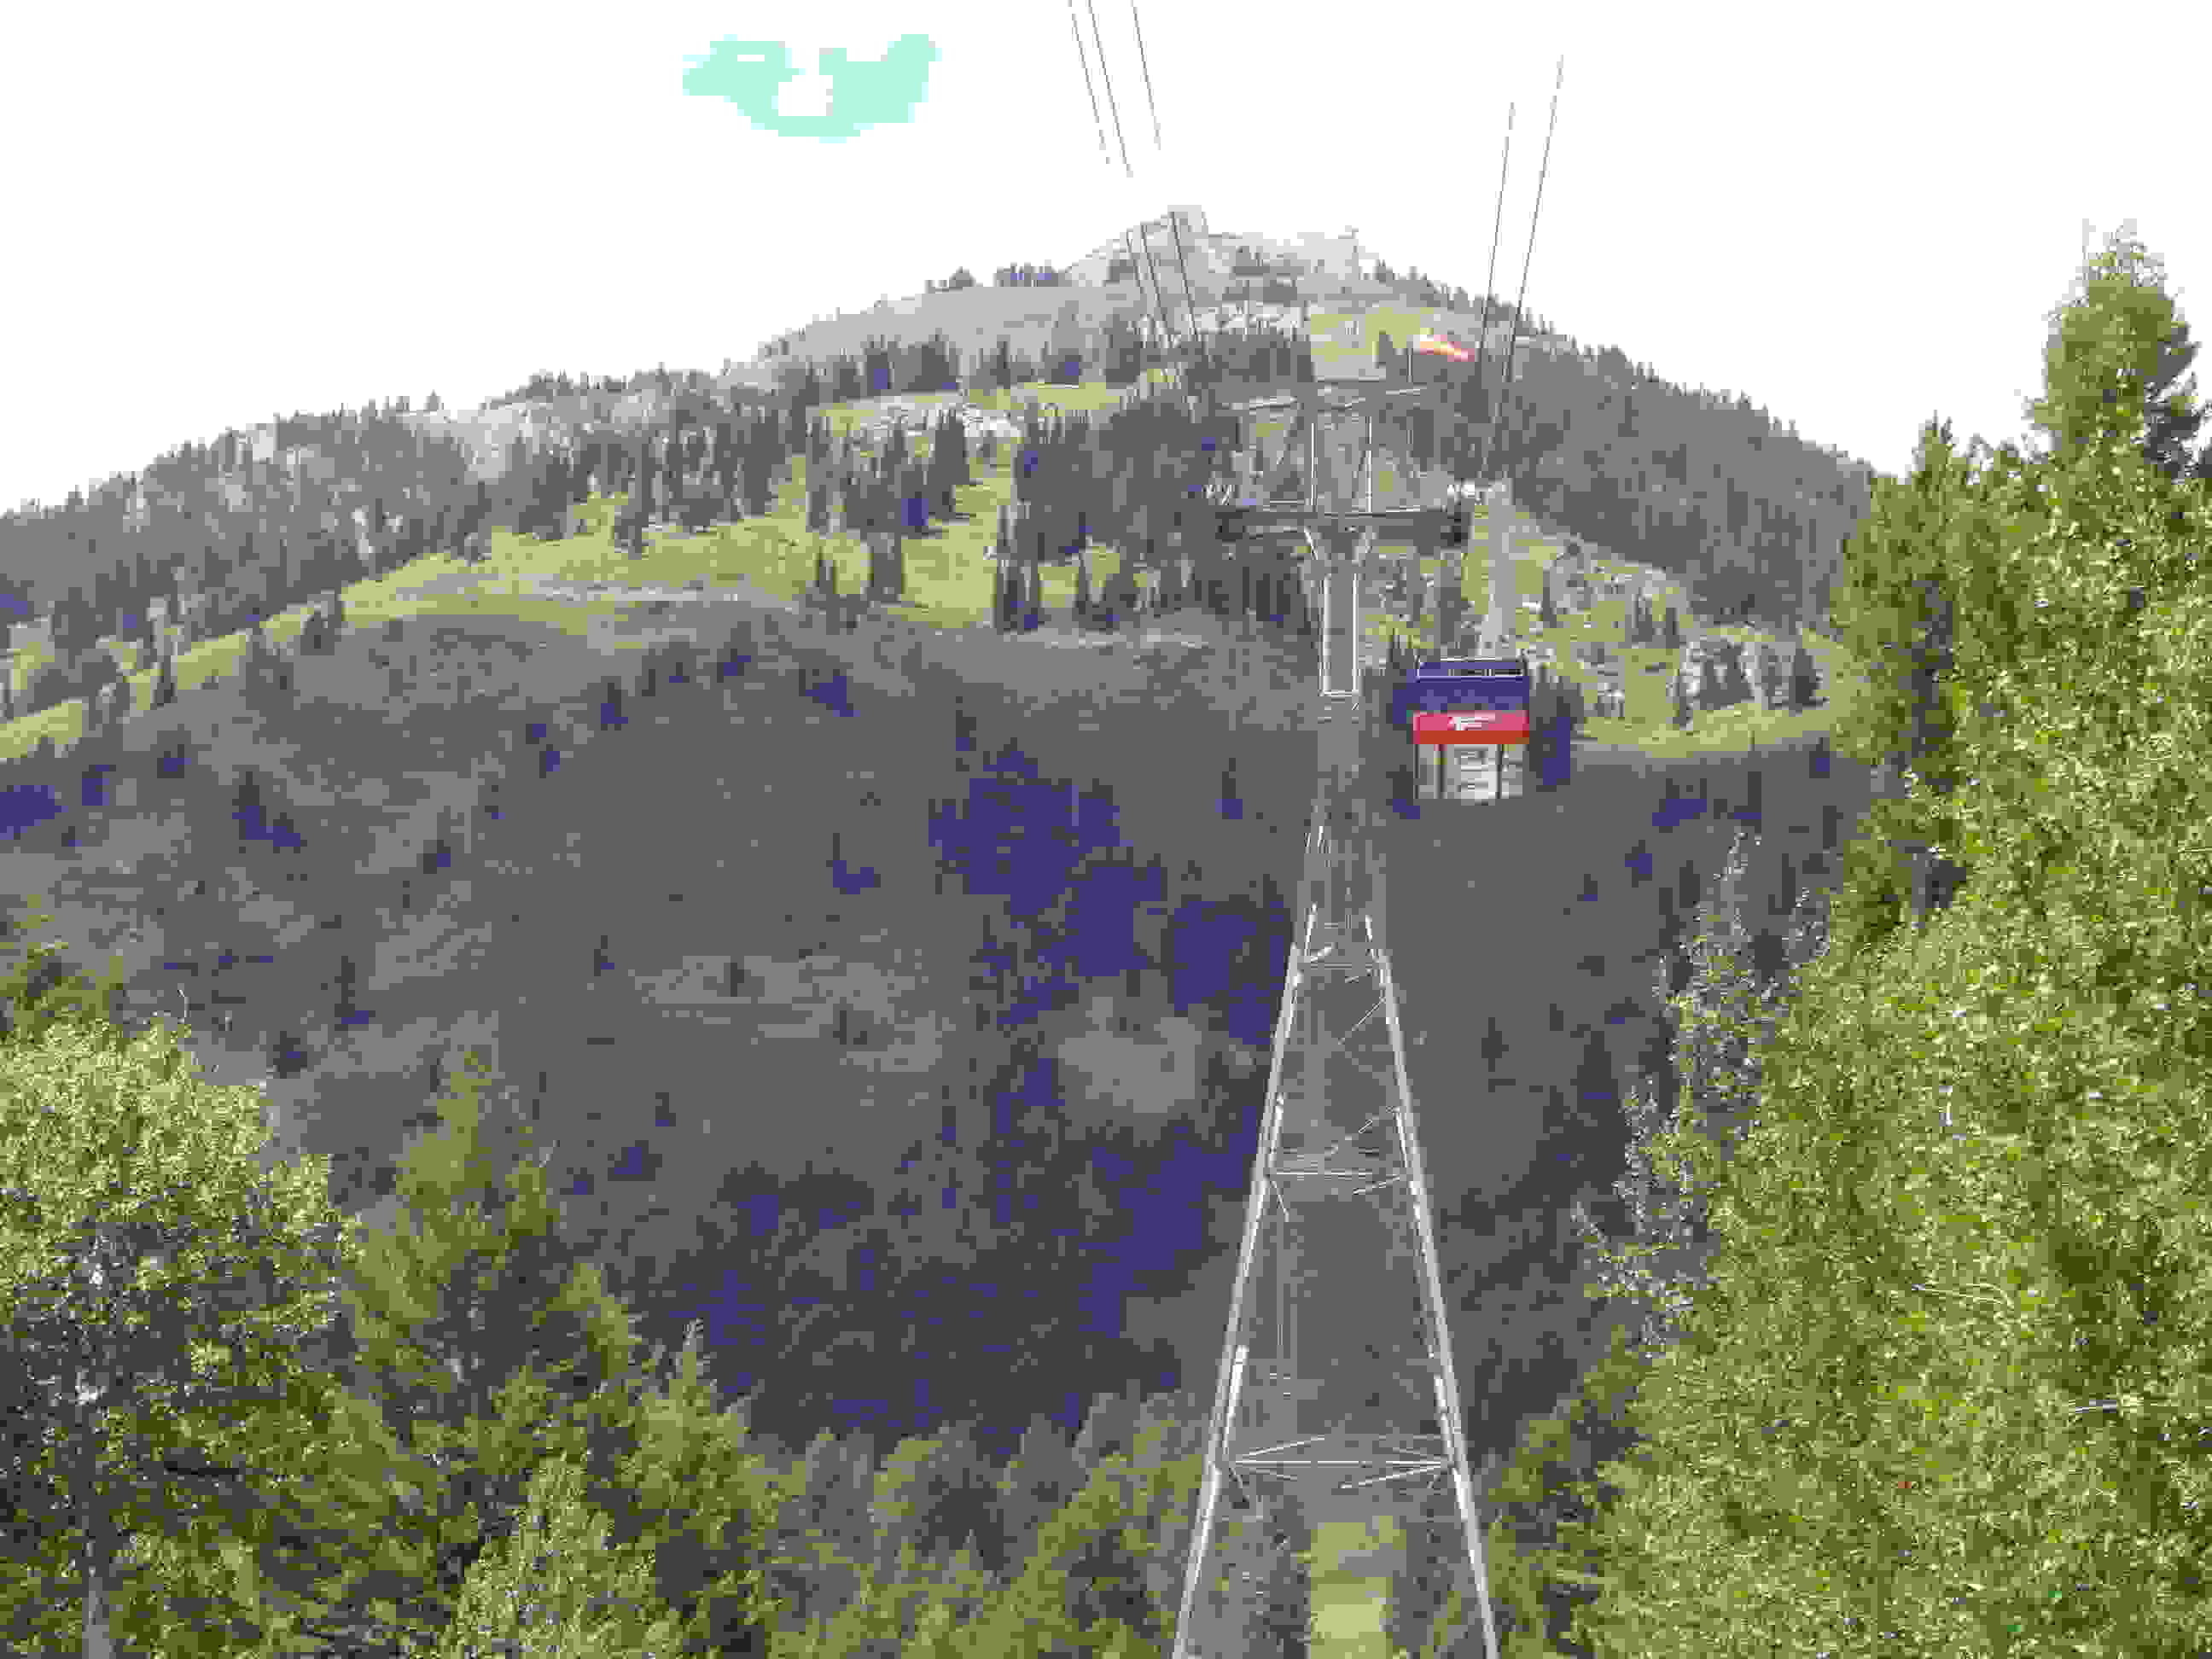 JHMR Tram & Trails